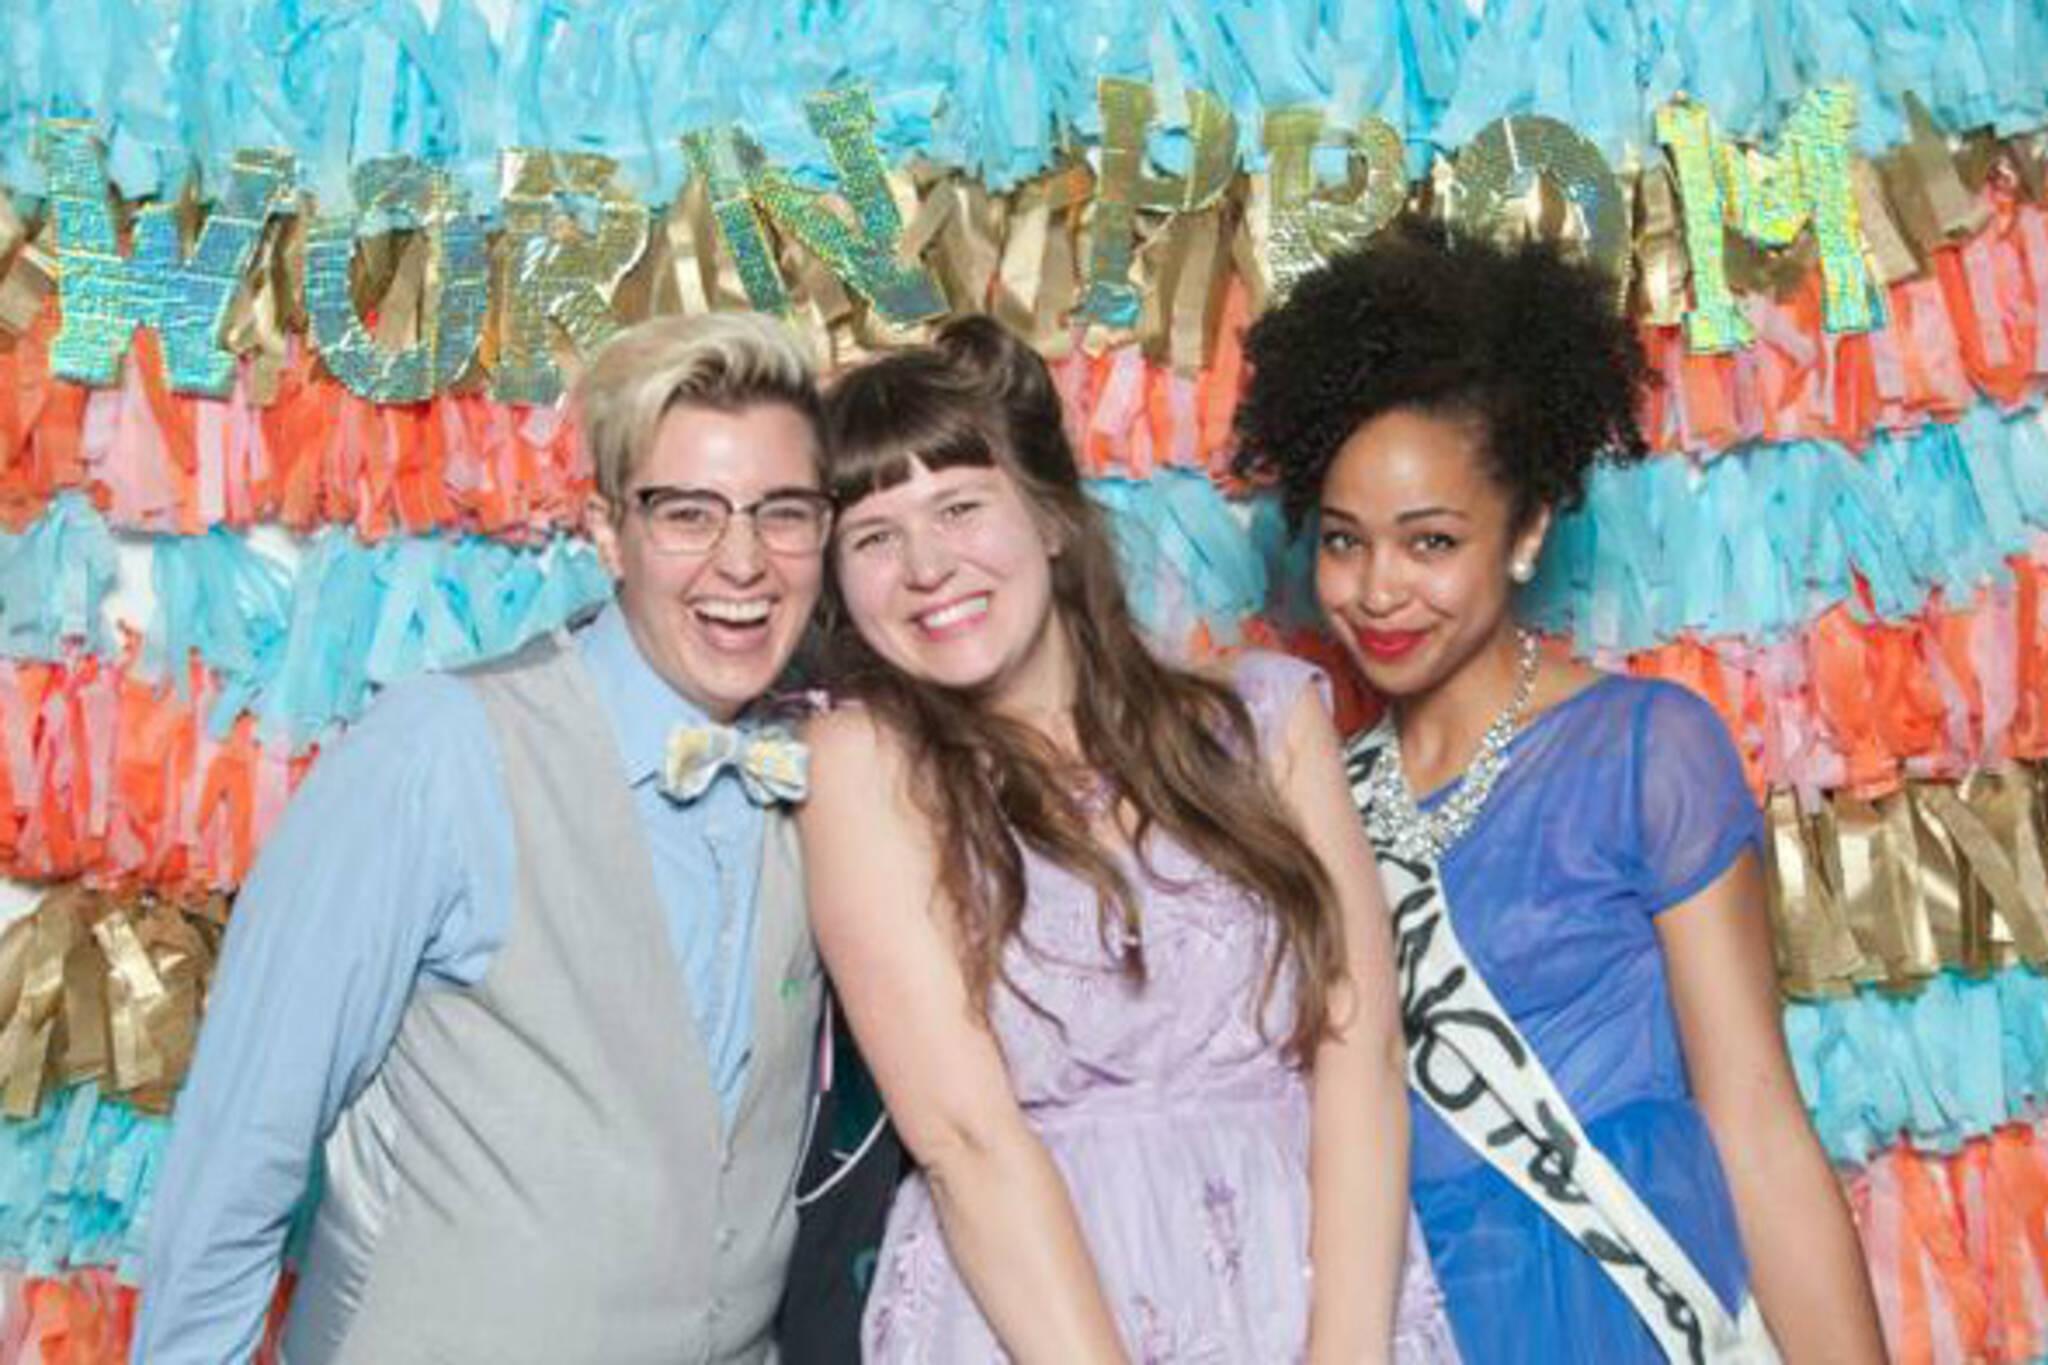 worn secondhand prom